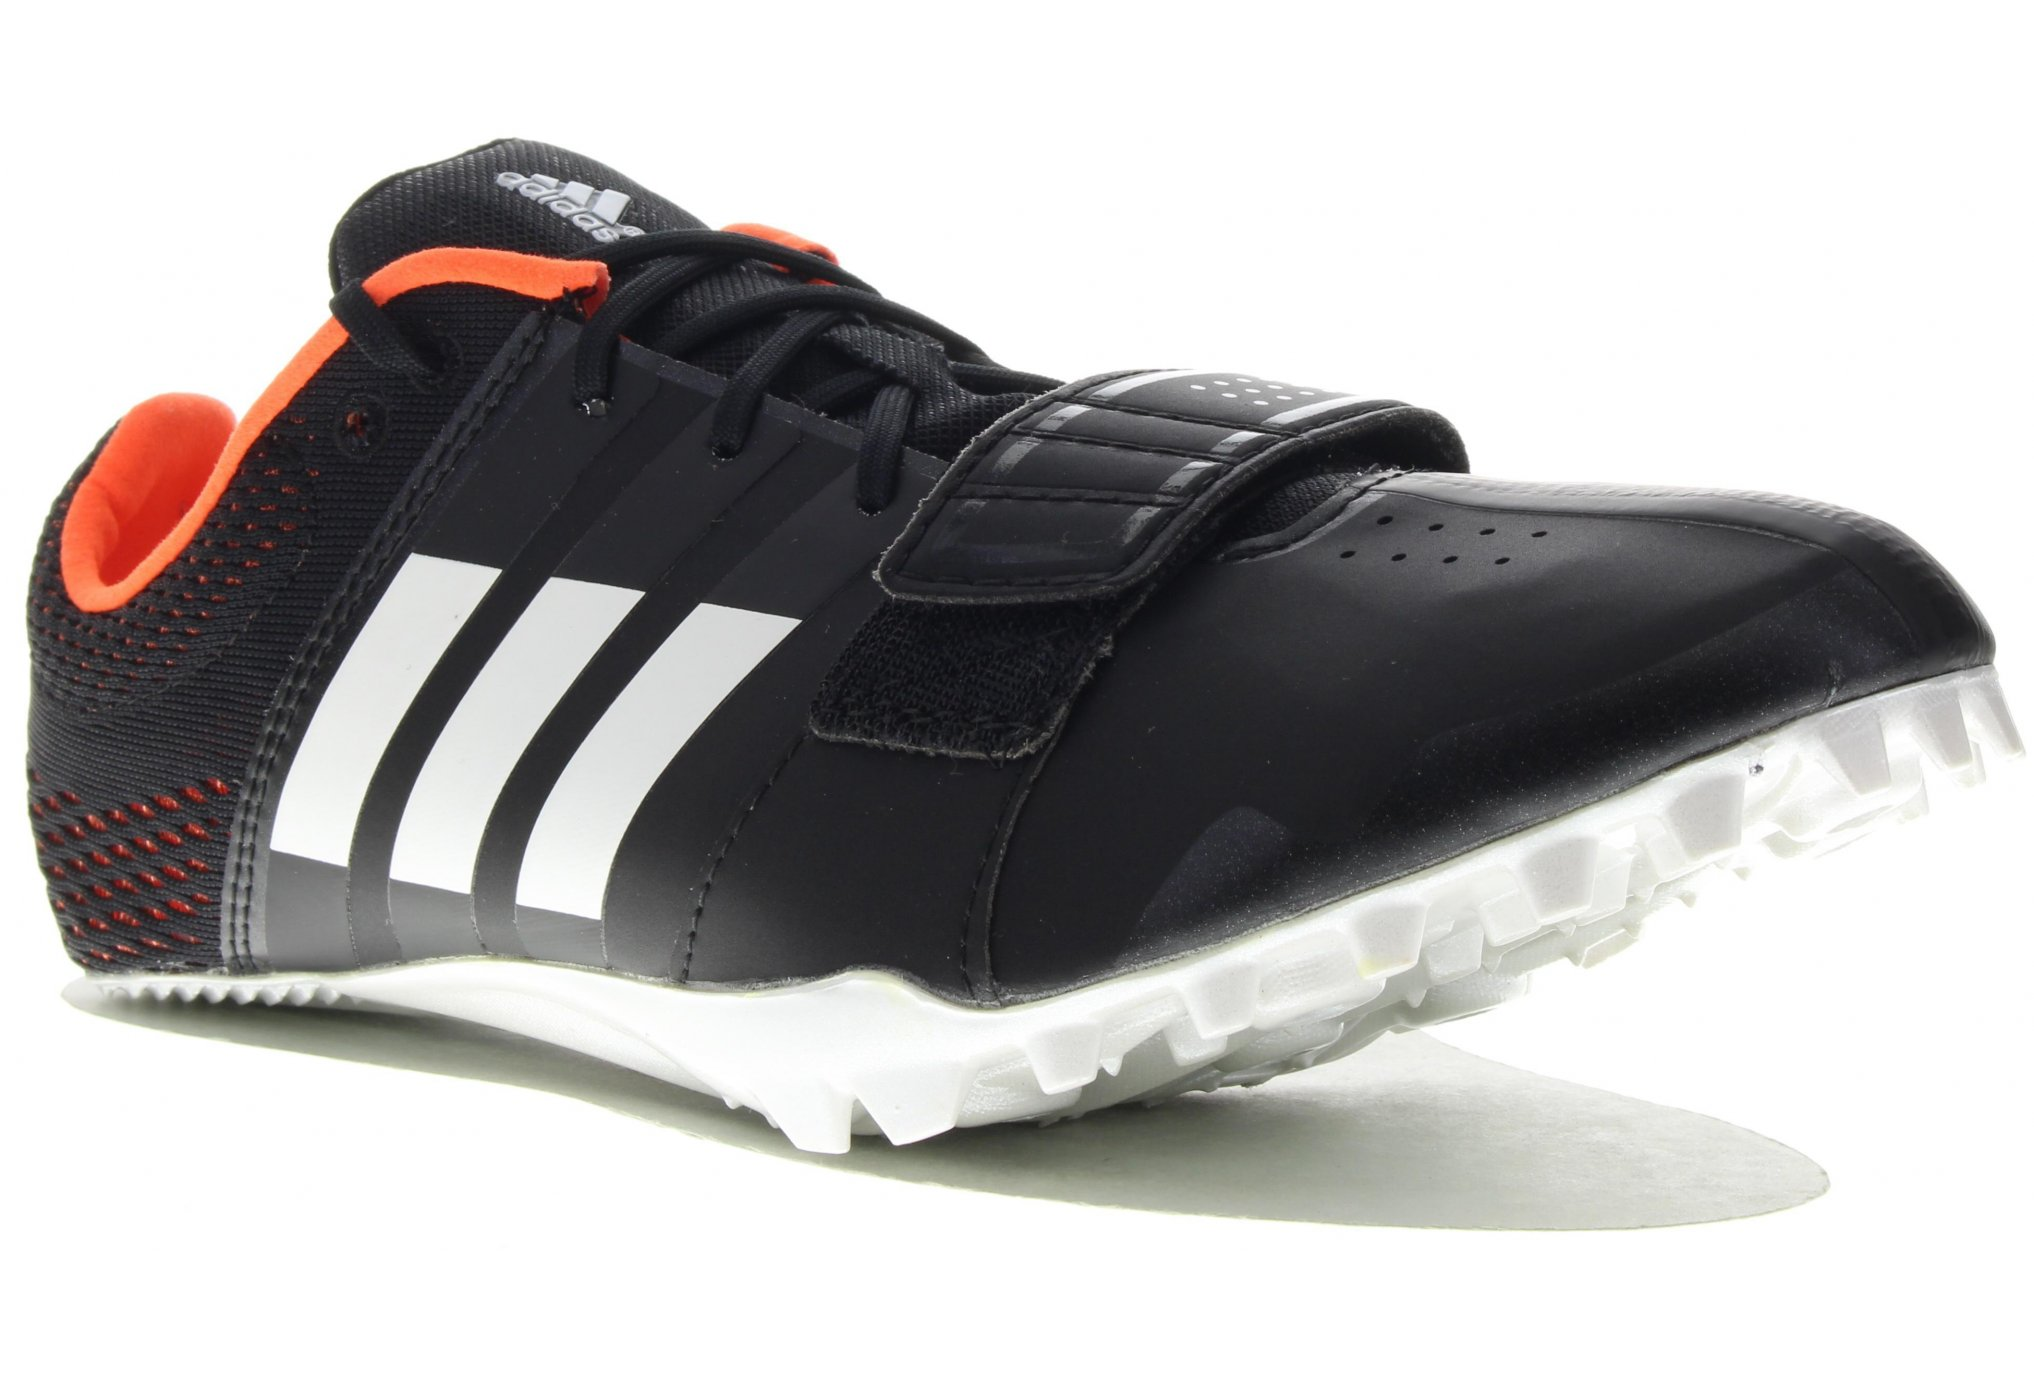 adidas-adizero-accelerator-m-chaussures-homme-222624-1-sz.jpg cf43f4893afb